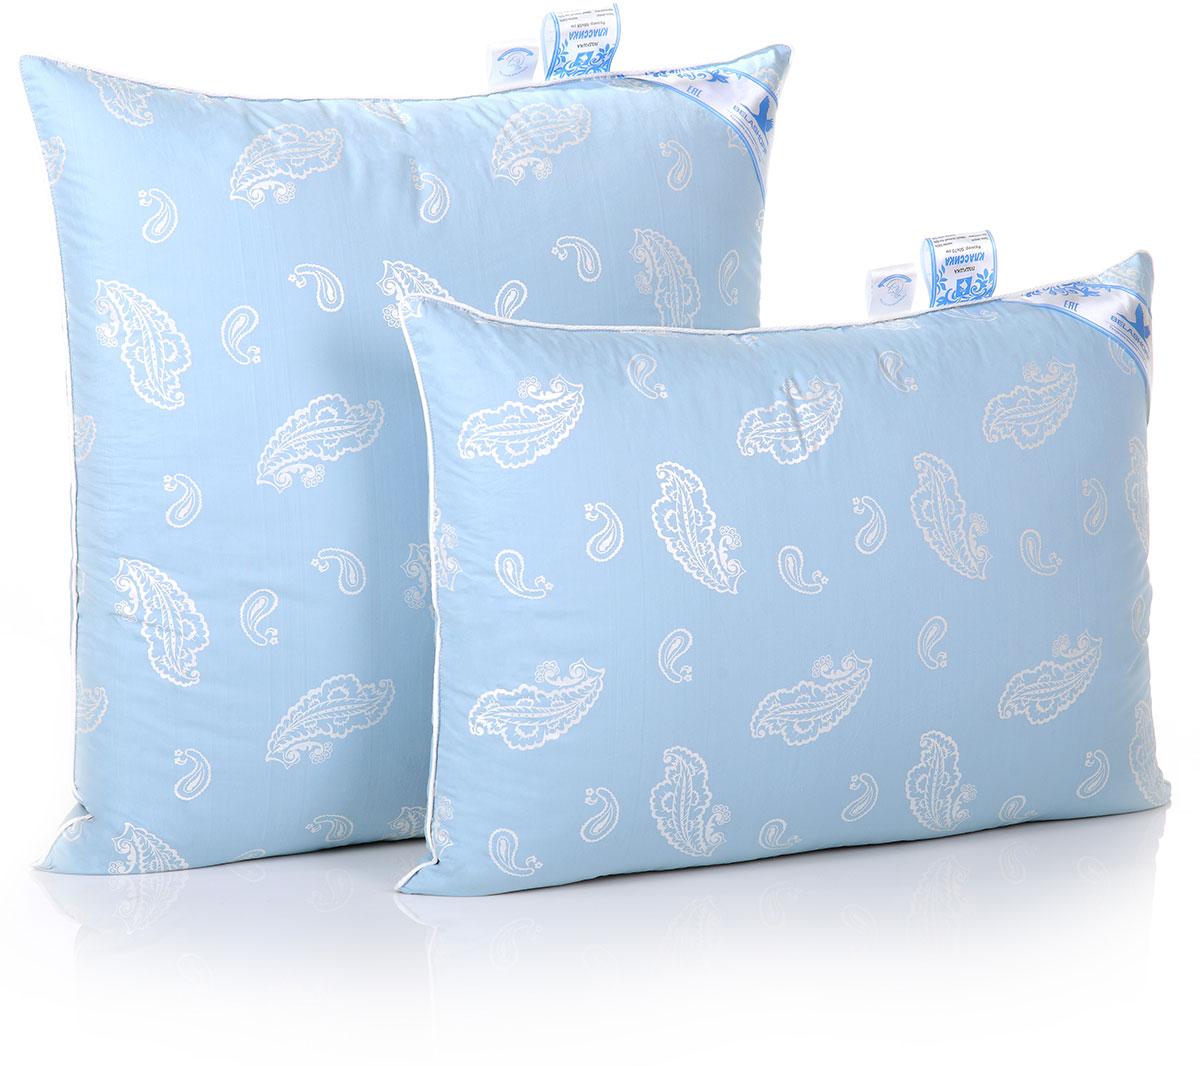 Подушка Belashoff Классика, цвет: голубой, 60 х 60 см